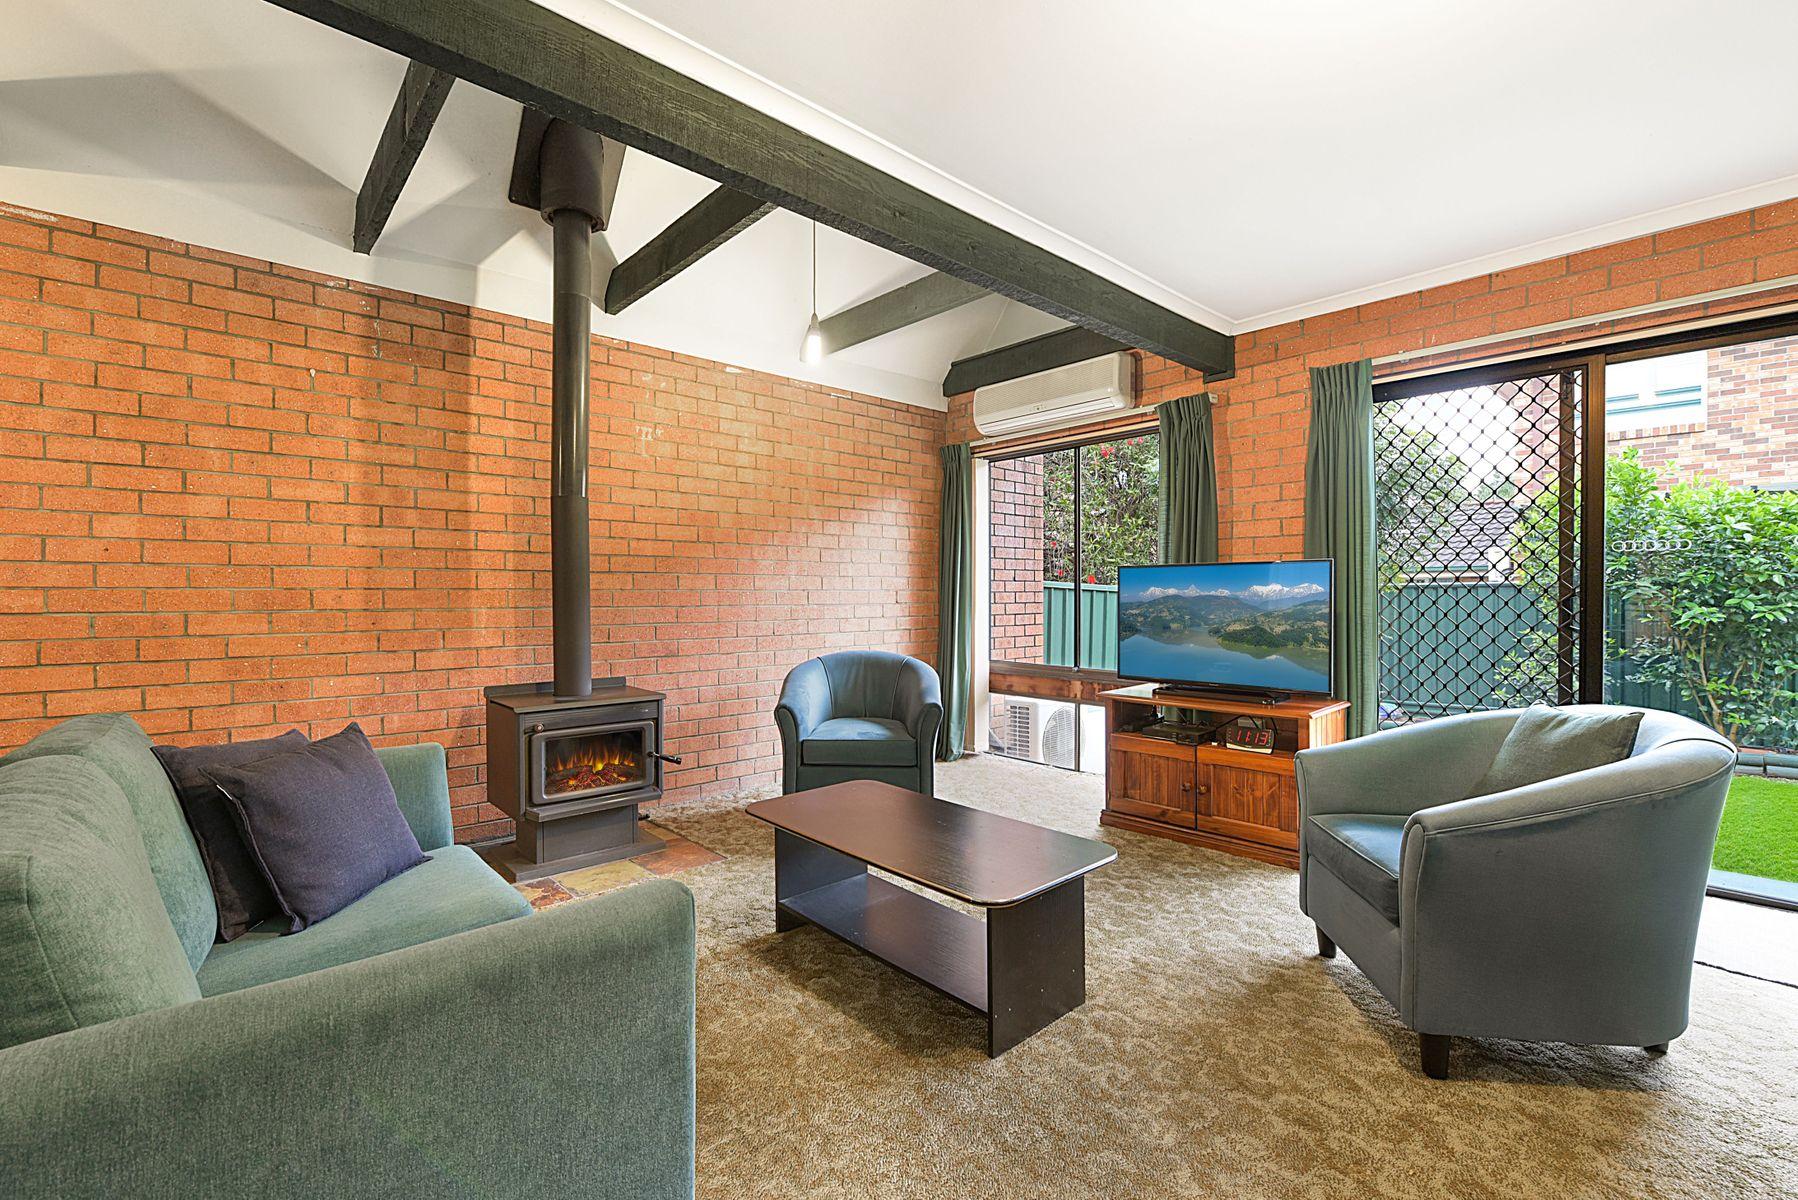 12/43 Rudd Road, Leumeah, NSW 2560